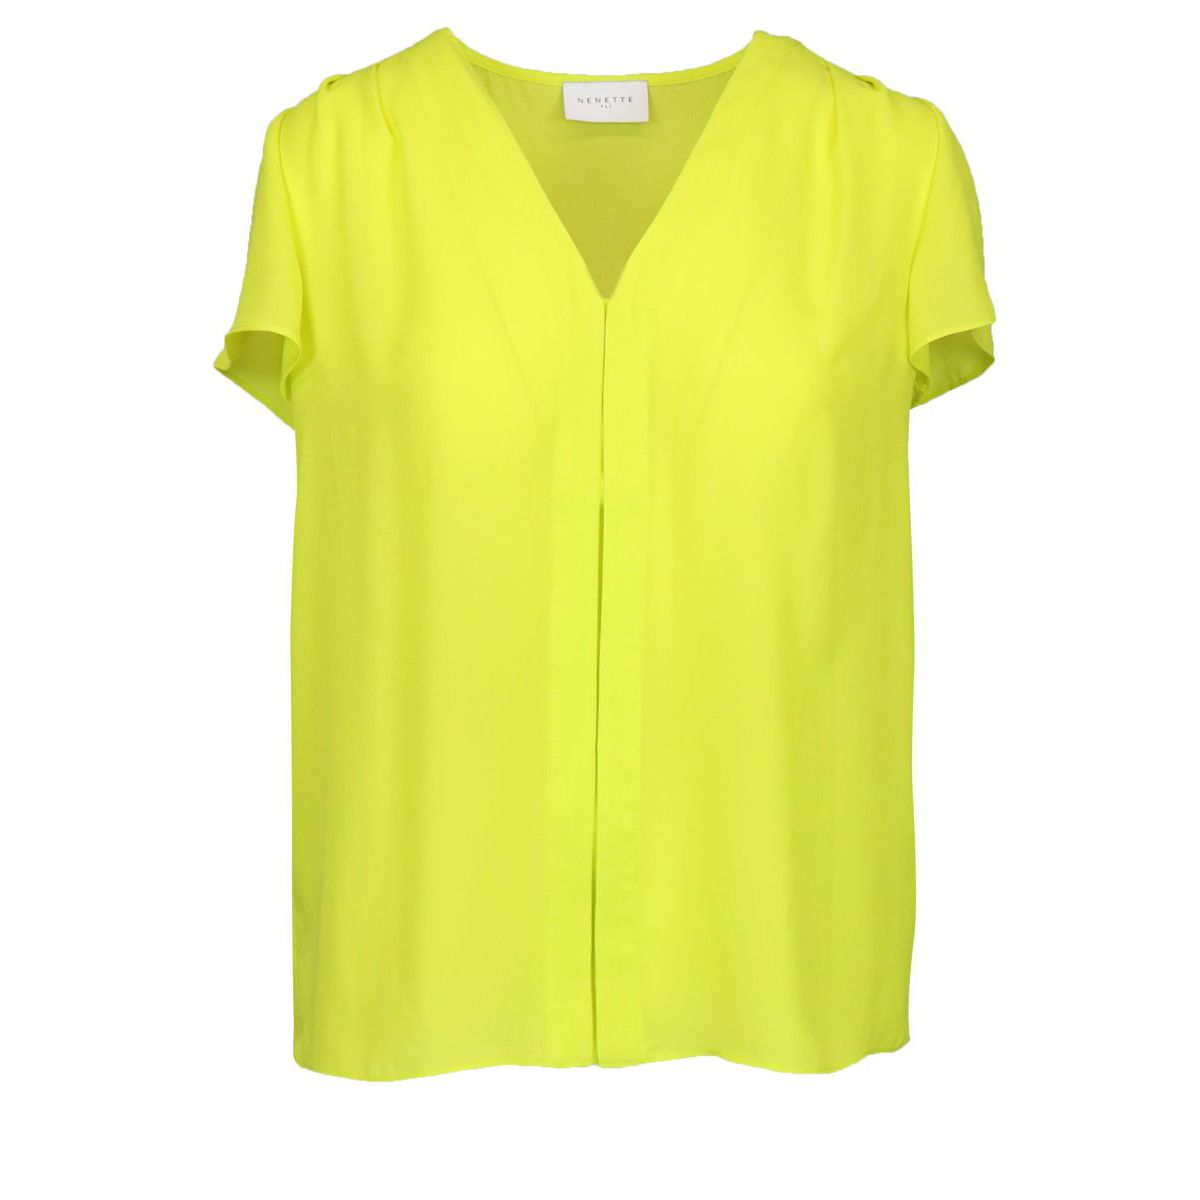 Flaminia shirt Yellow Nenette